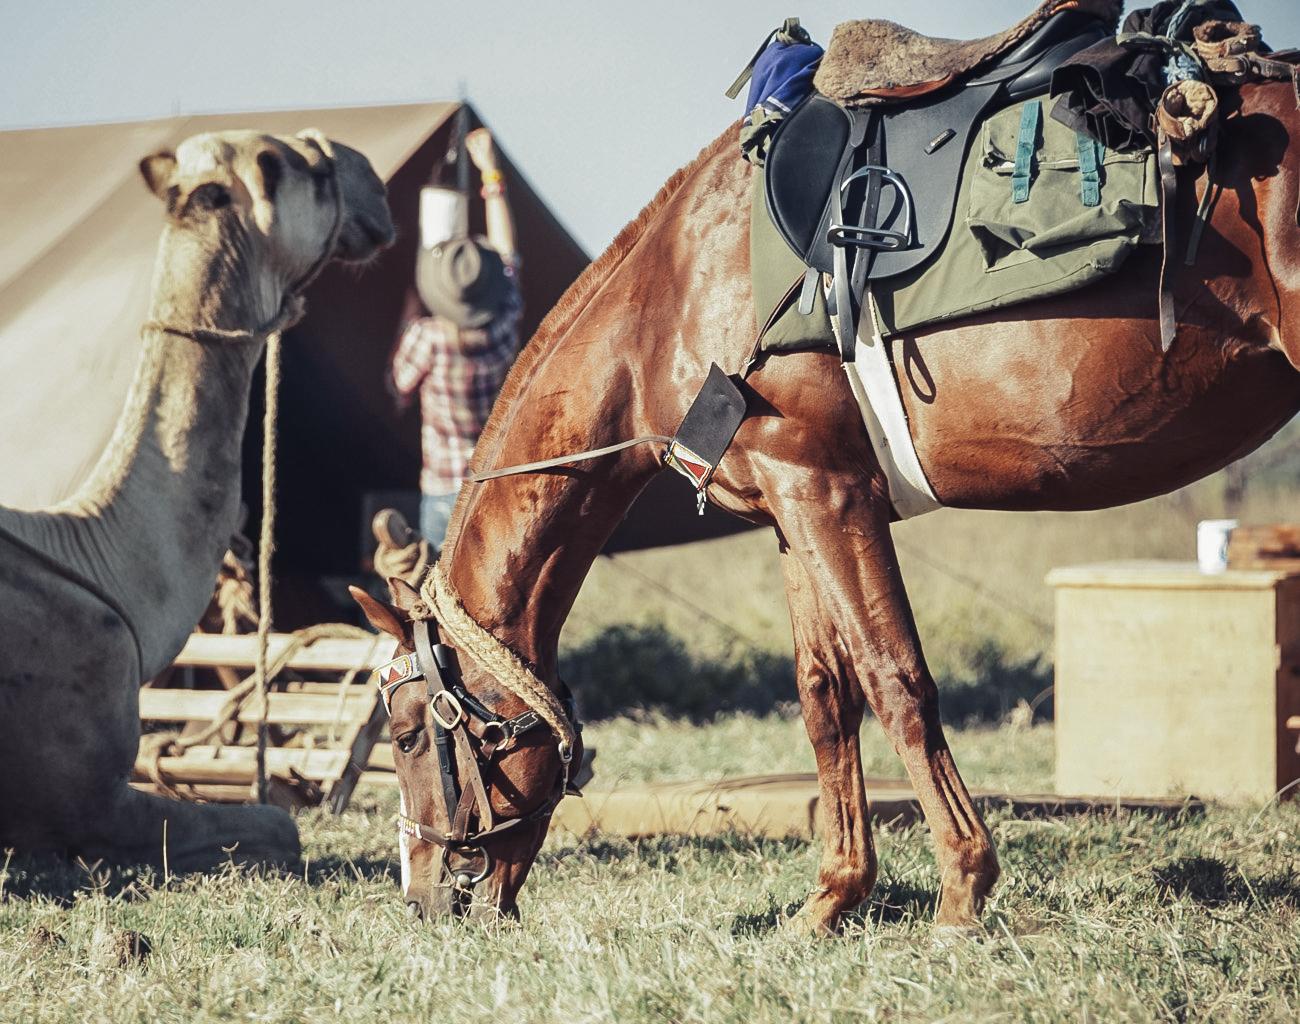 NOMAD HORSE & CAMEL